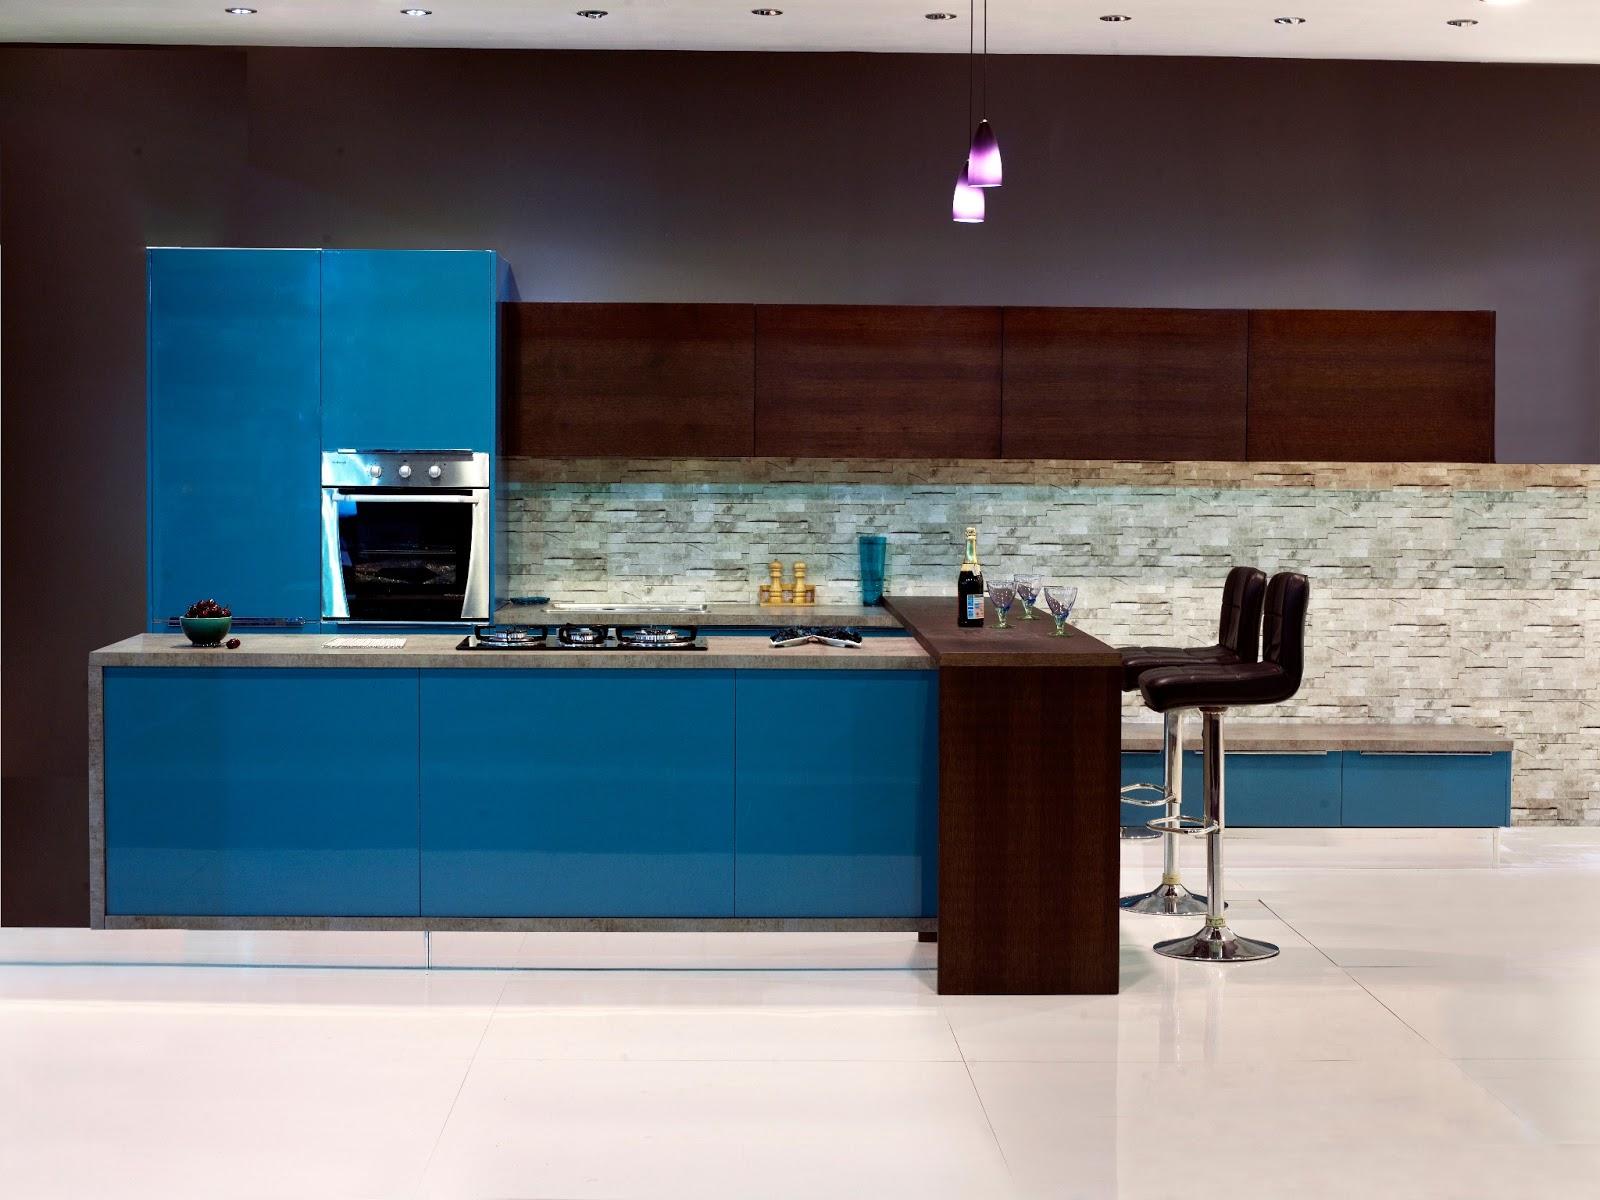 Sleek modular kitchen v s carpenter made kitchen how to maintain modular kitchen by sleek - Sleek kitchen world ...